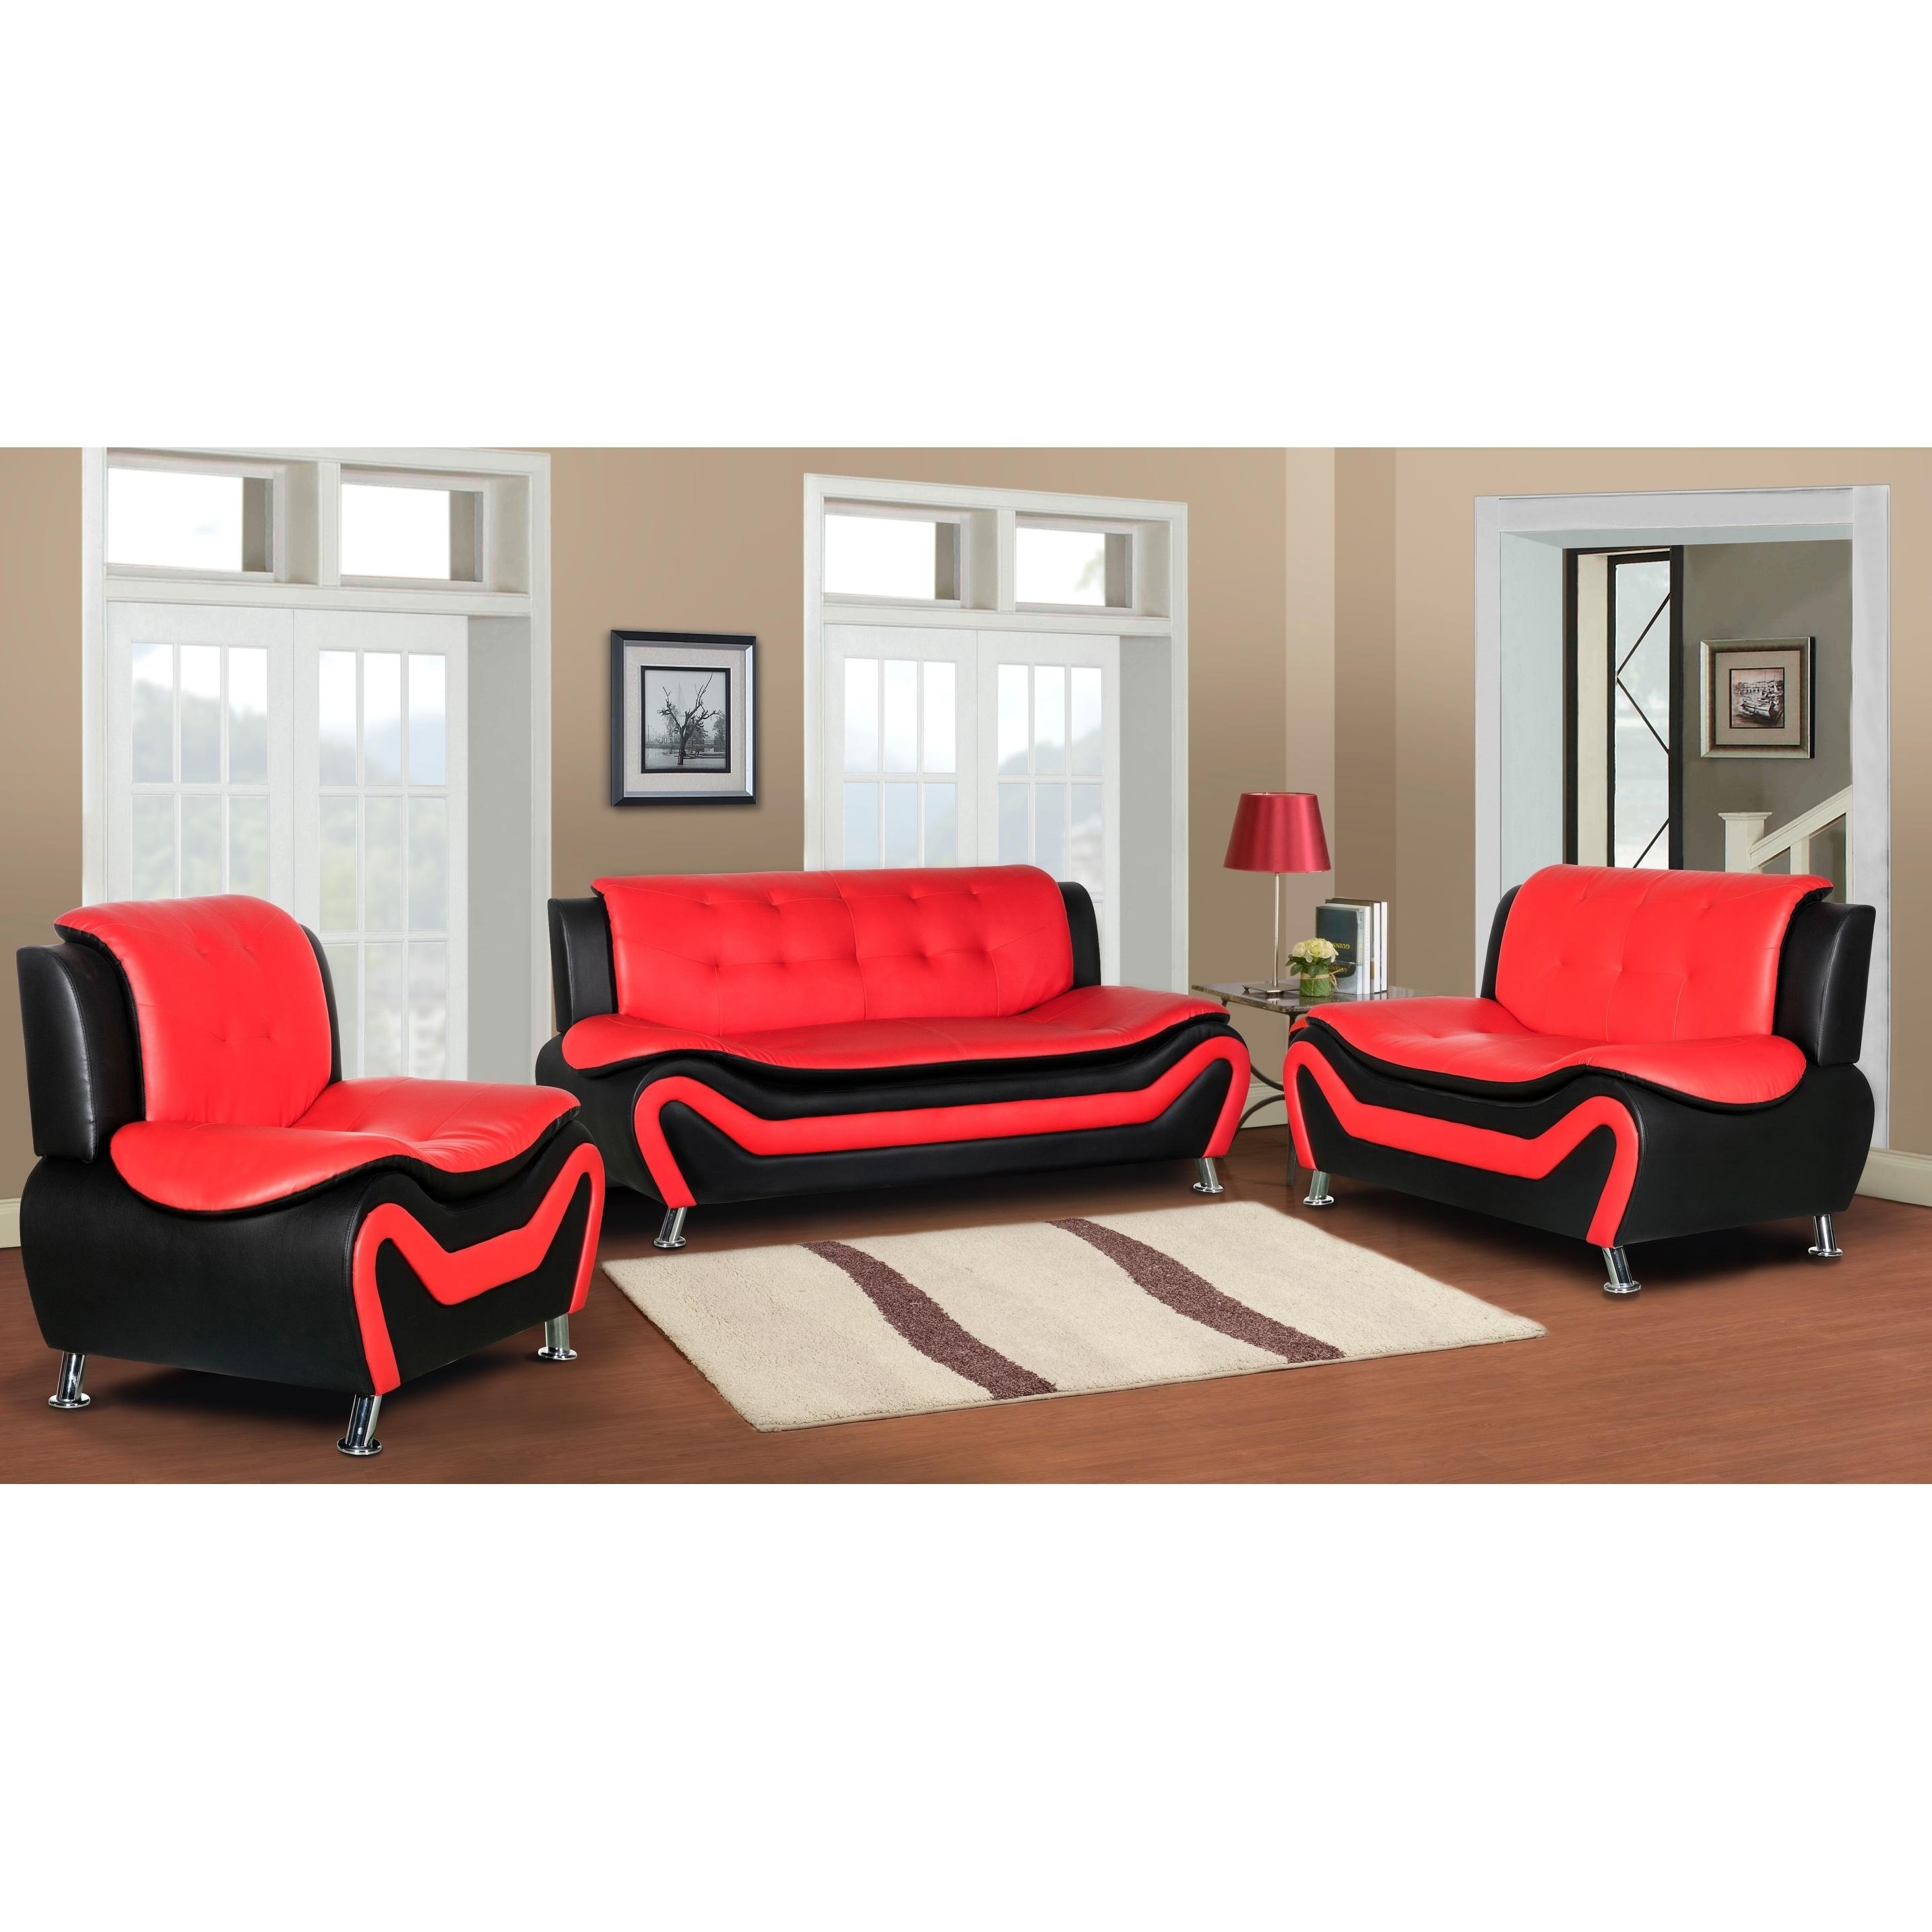 Jasmine Faux Leather 3pc Living Room Set On Sale Overstock 27564772